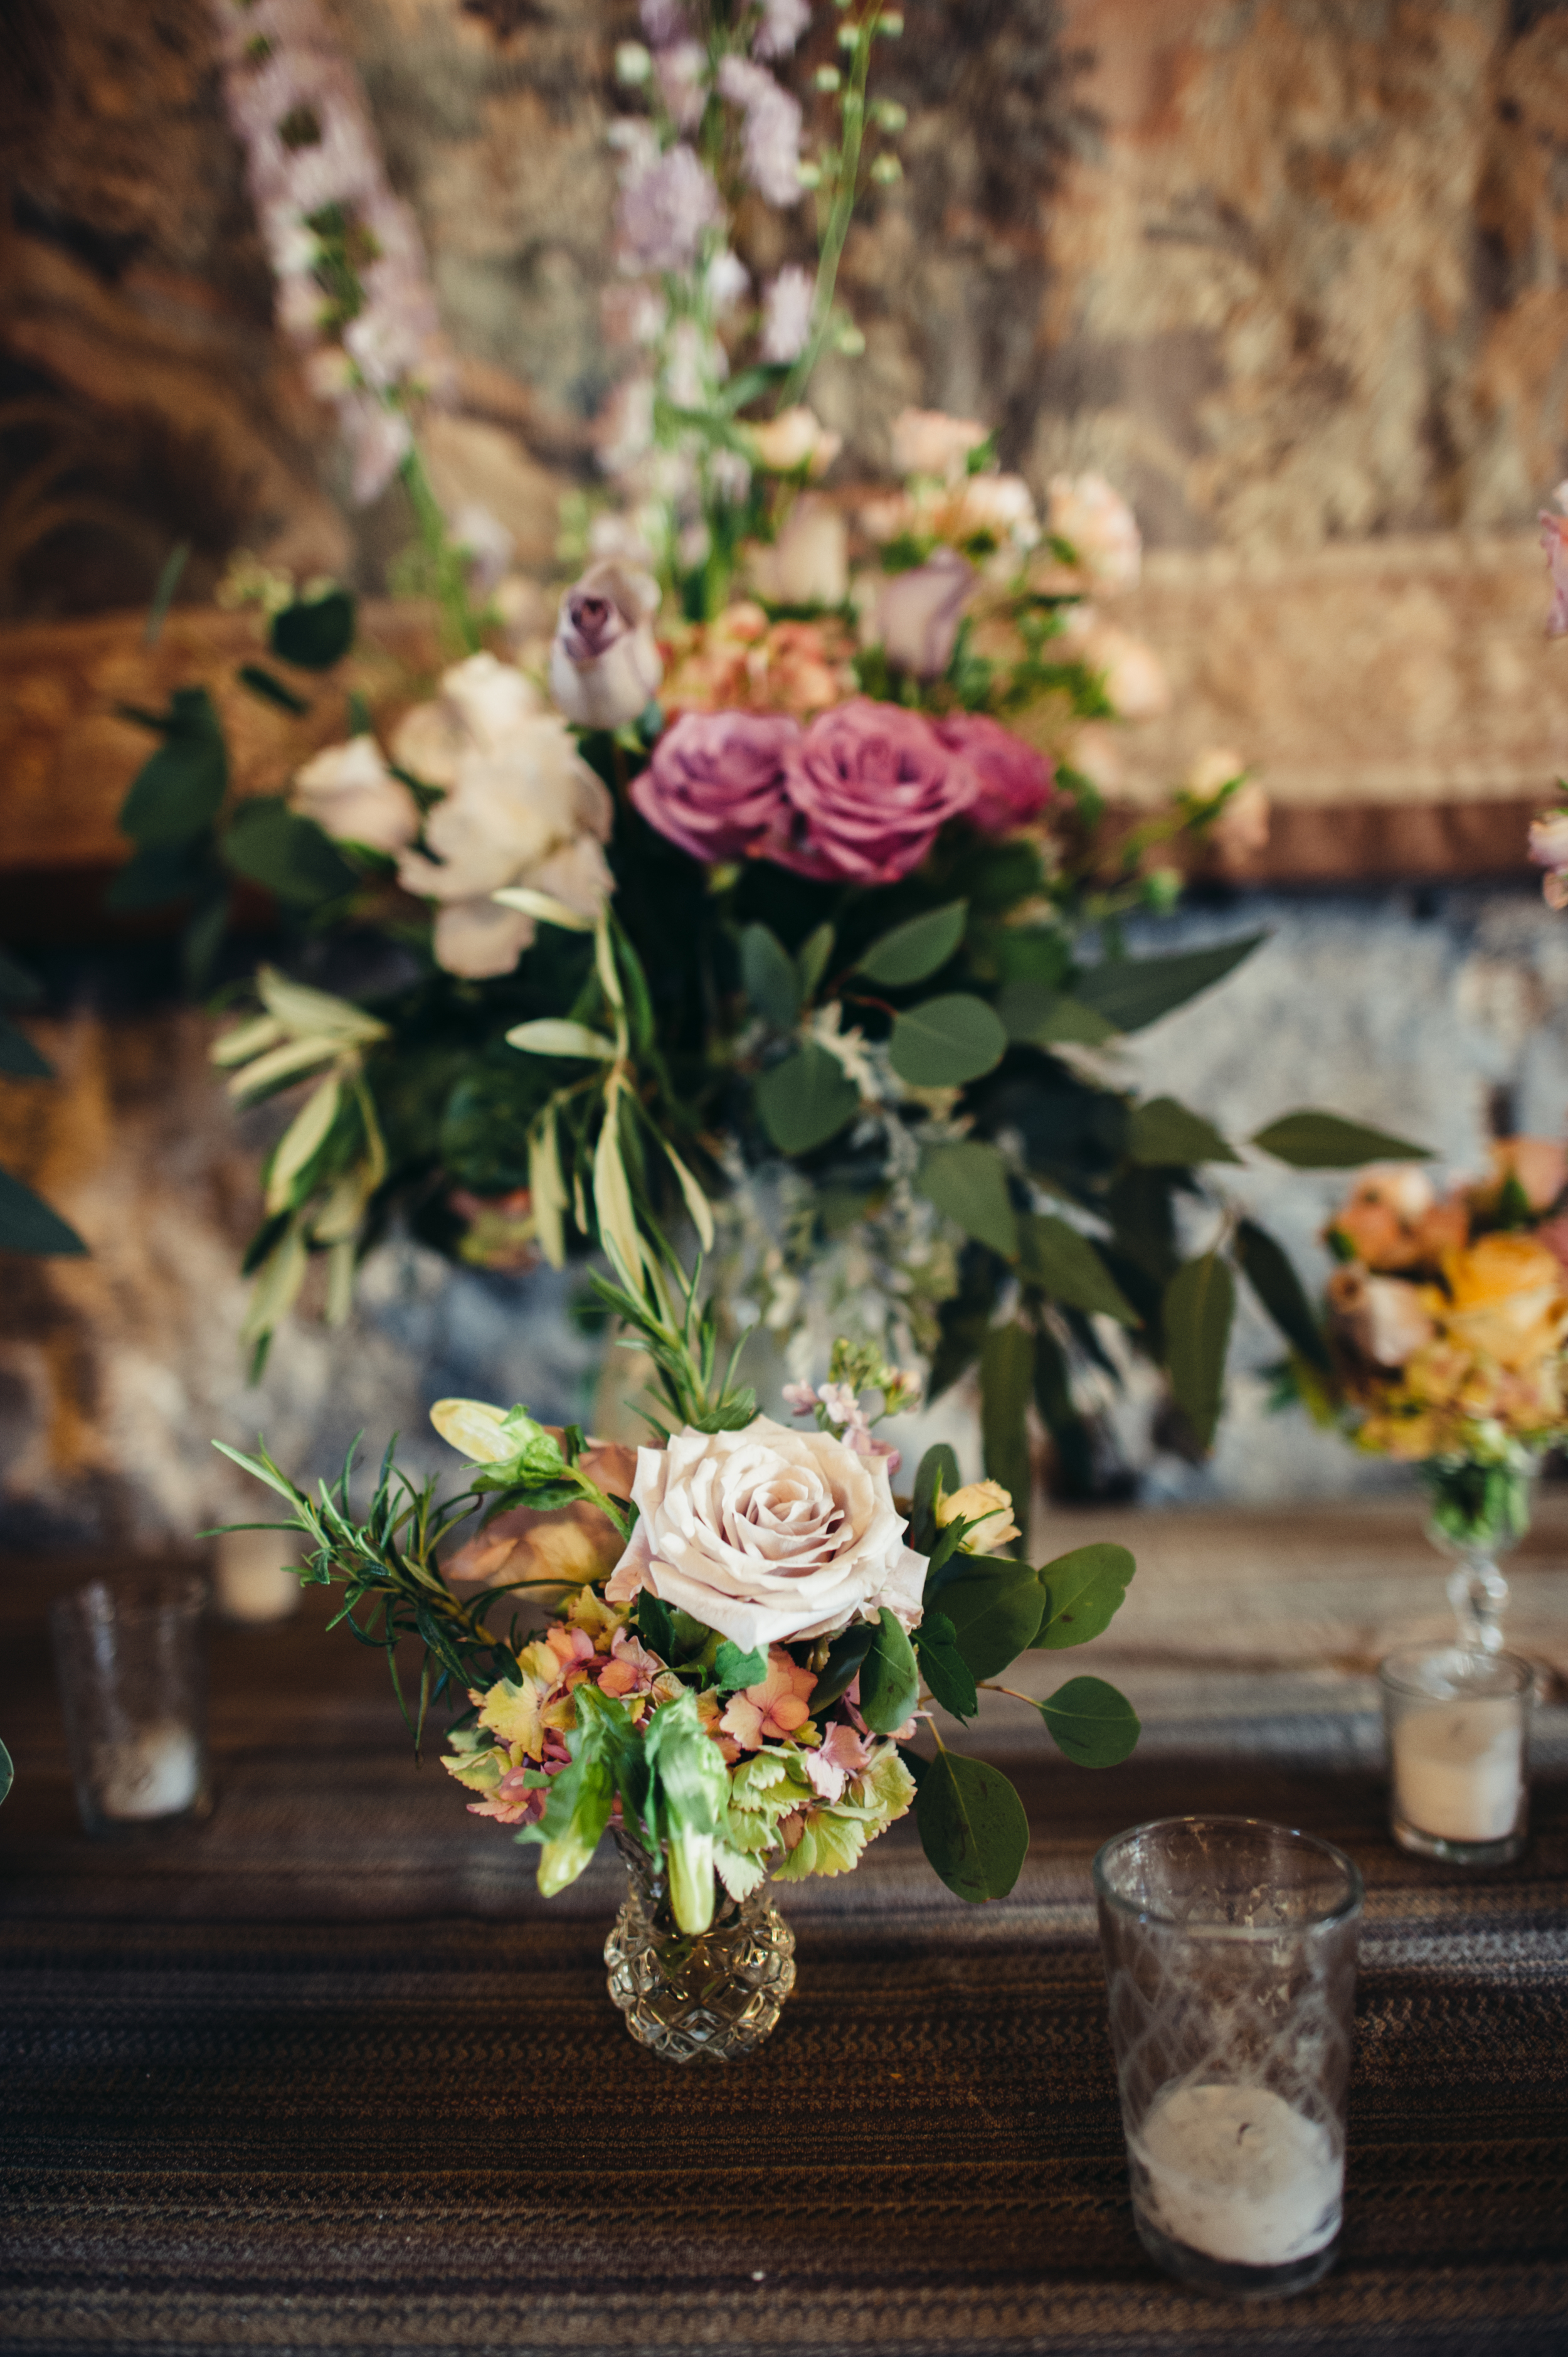 0021-lisa-devine-alternative-creative-wedding-photography-glasgow-edinburgh.JPG